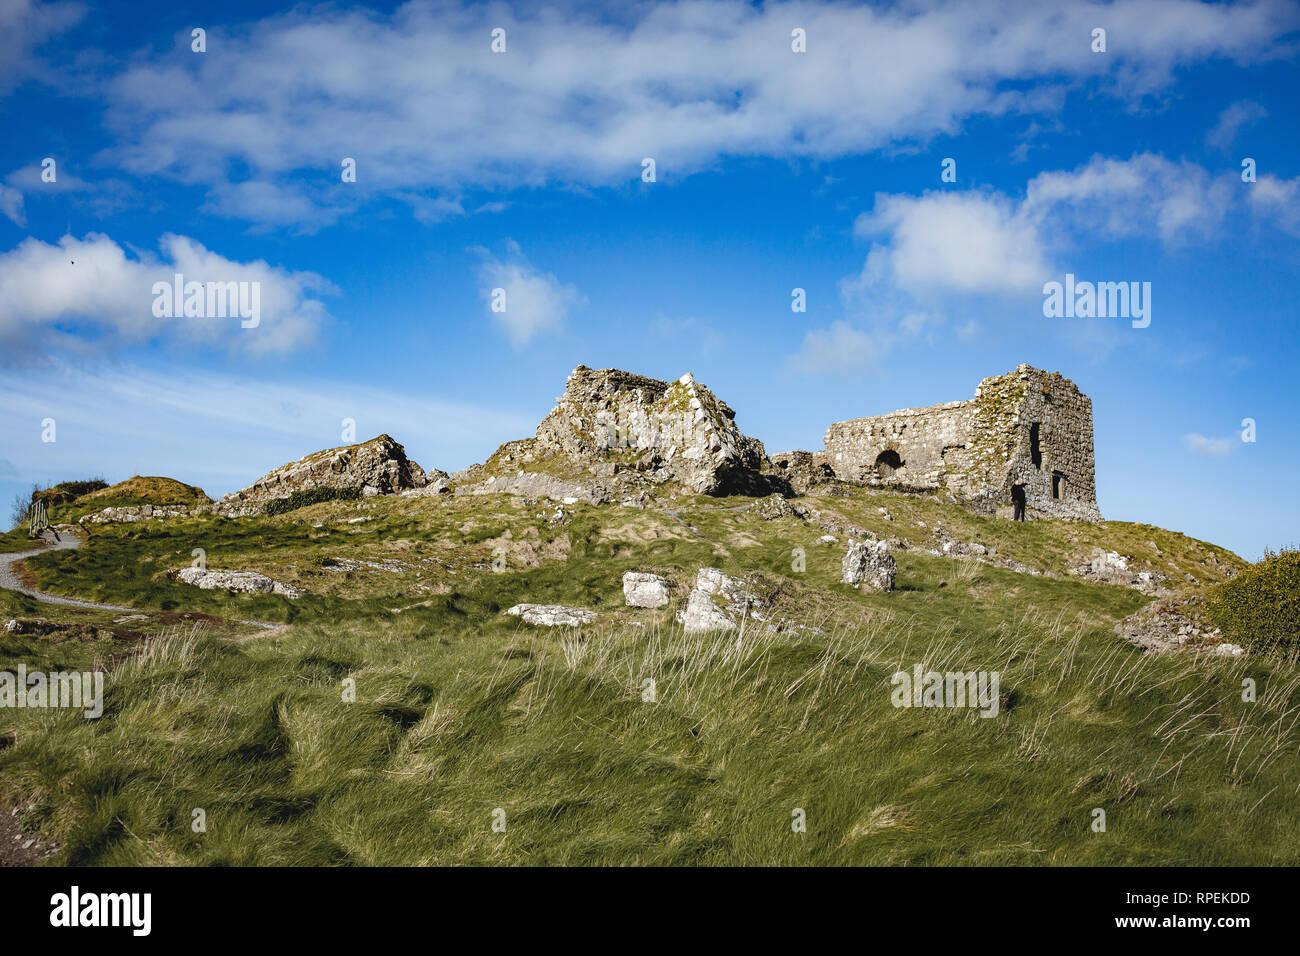 The Slieve Bloom mountains - Outdoor activities, heritage